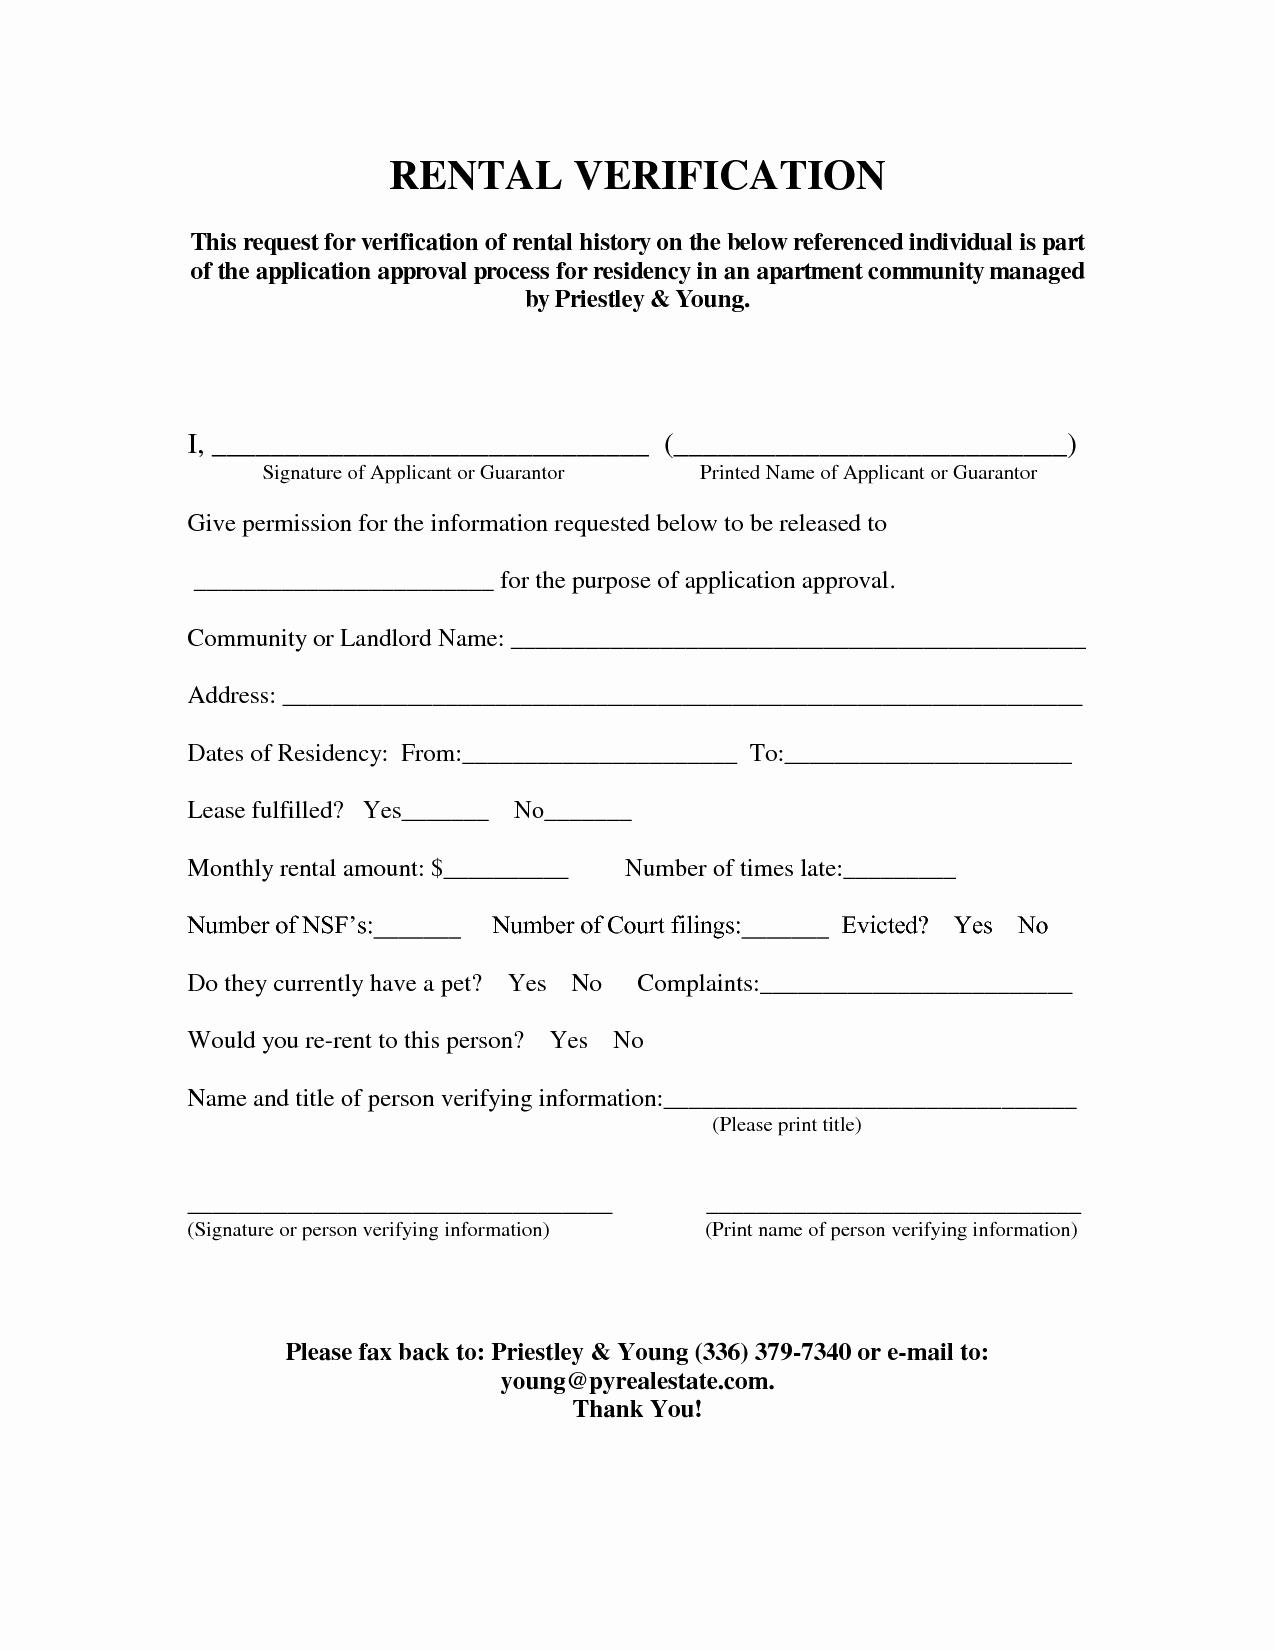 Landlord Verification form Template Elegant Rental Verification form Rent Verification